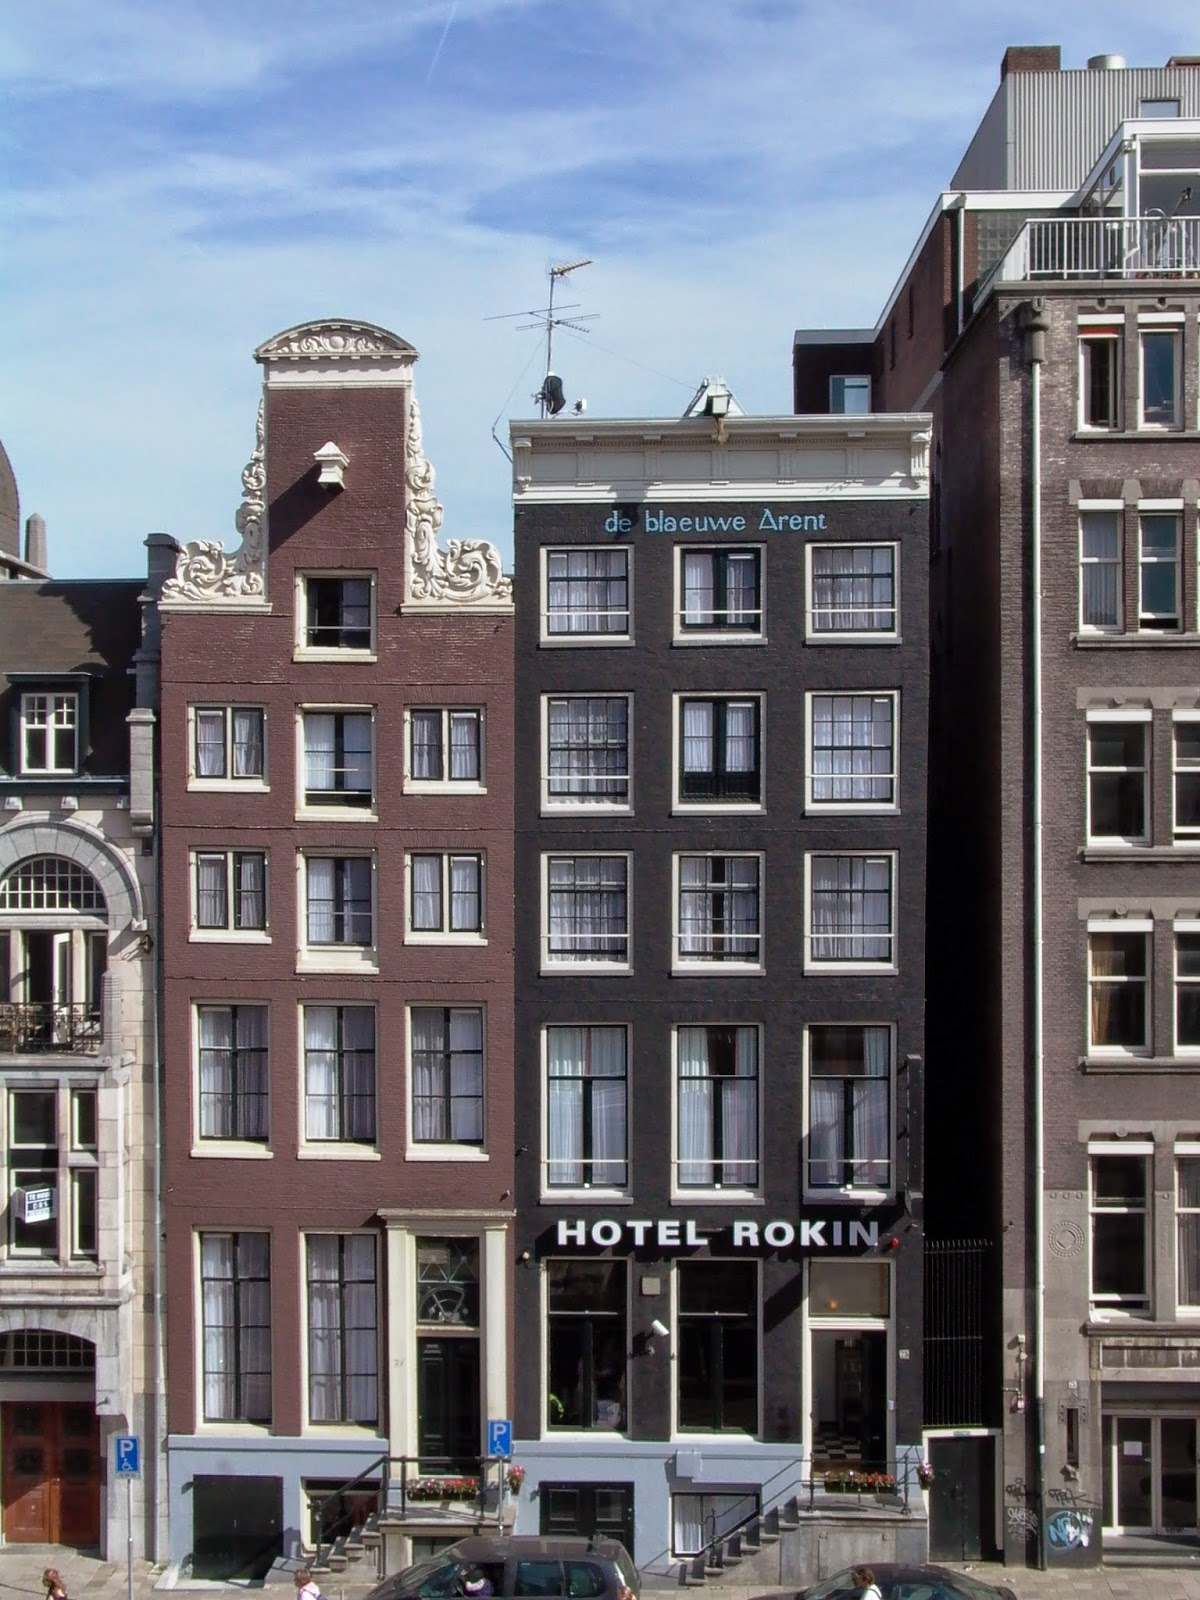 Hotel Rokin Amsterdam accepteert American Express Credit Cards